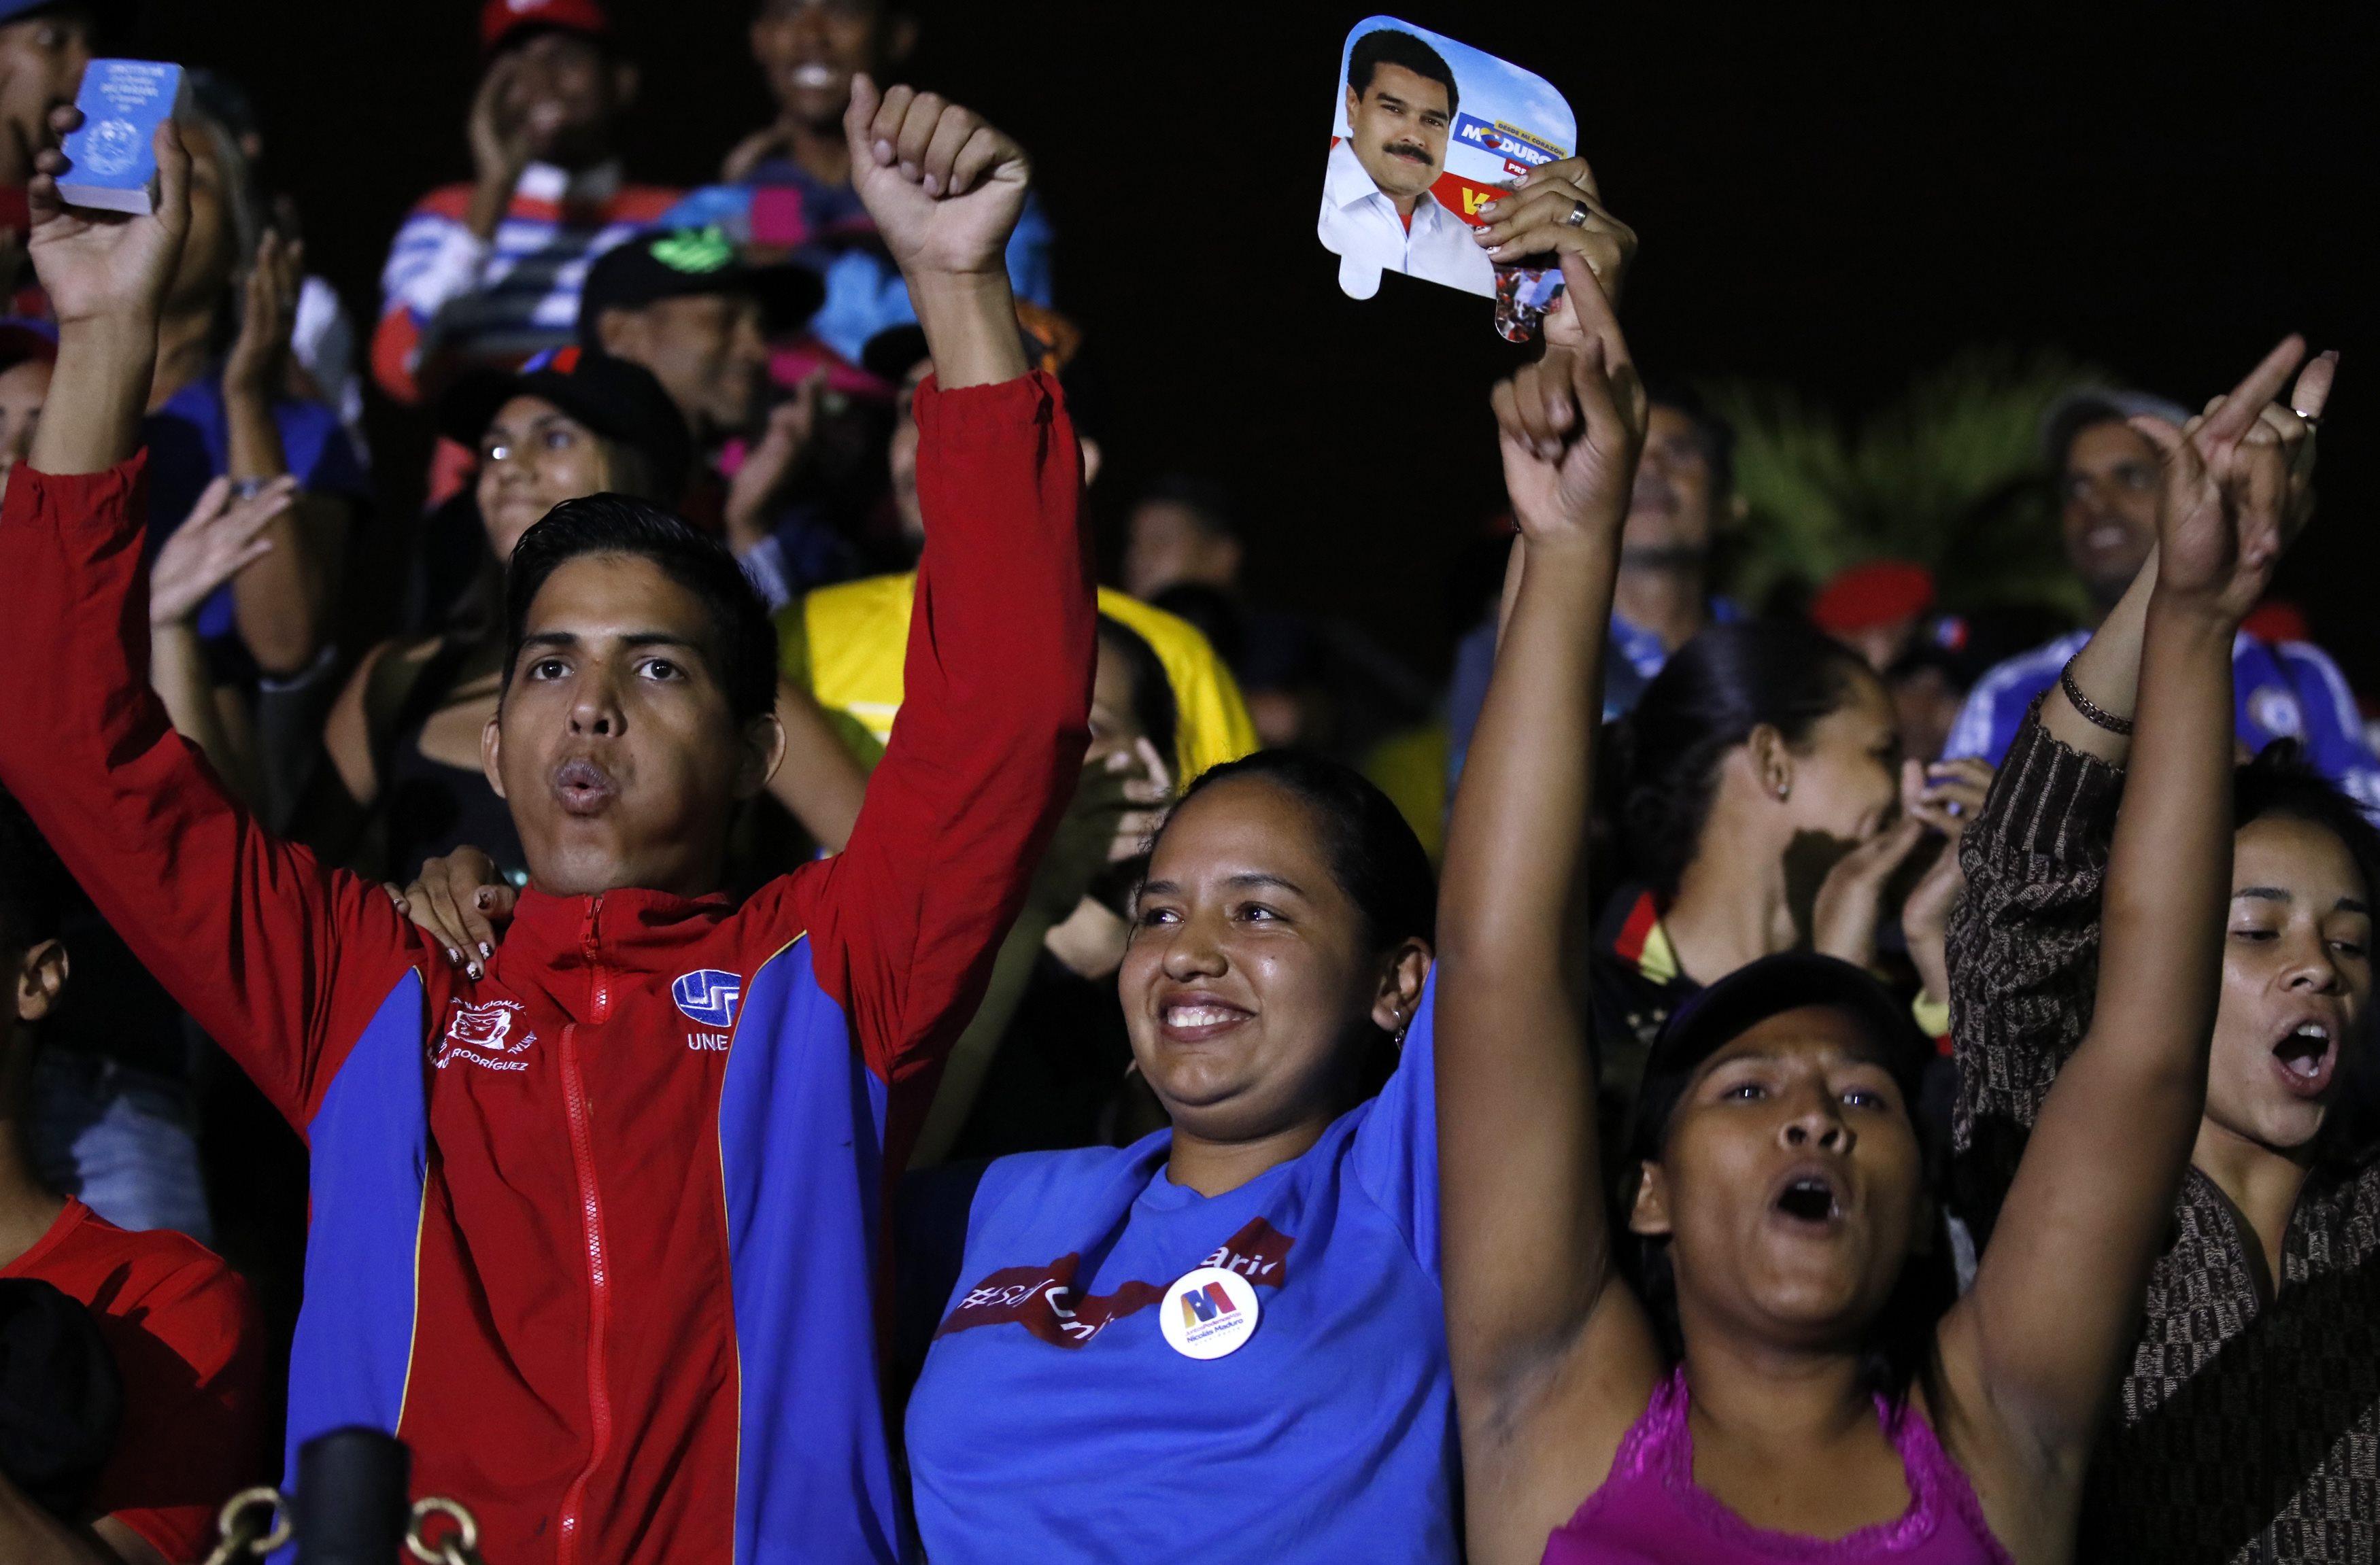 venezuelan people 2020 - HD3500×2302